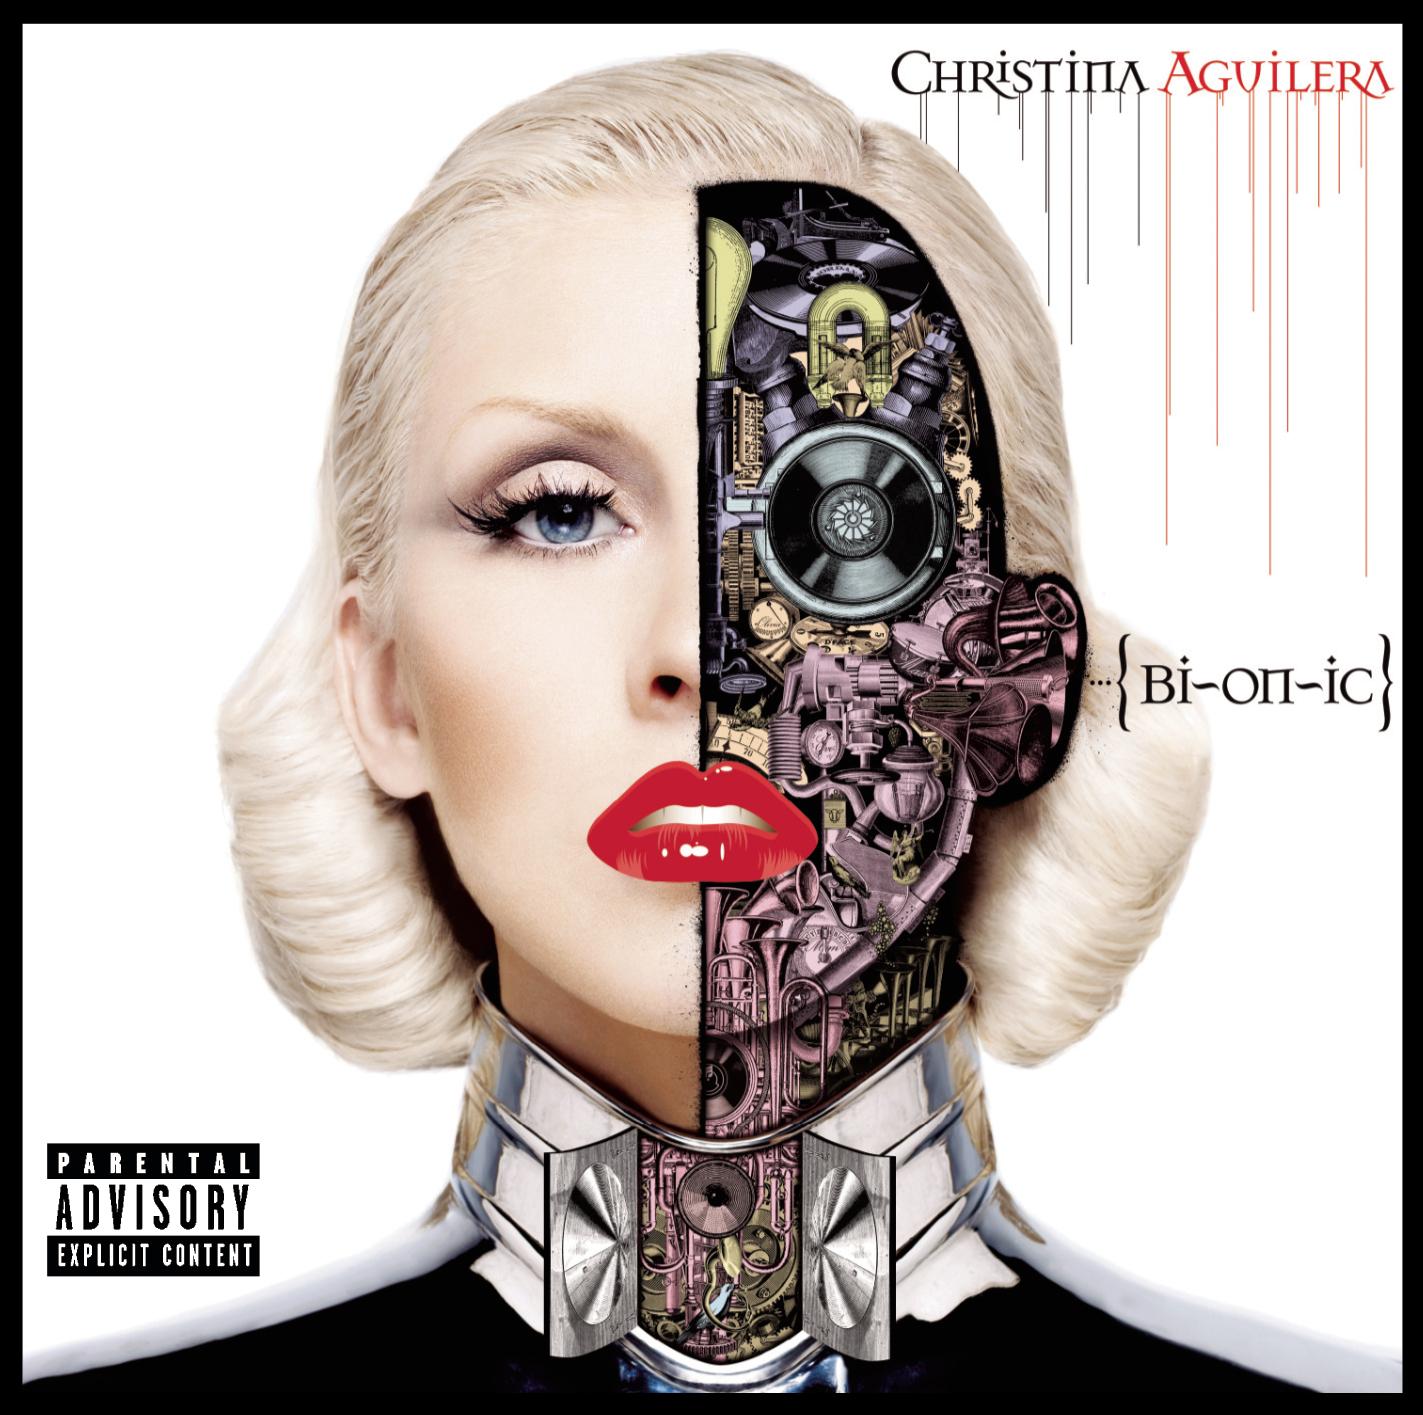 http://2.bp.blogspot.com/_dl8QaFOi1rw/TMYWd7yAtRI/AAAAAAAAA10/Jq38SnzoRCQ/s1600/Christina+album.jpg